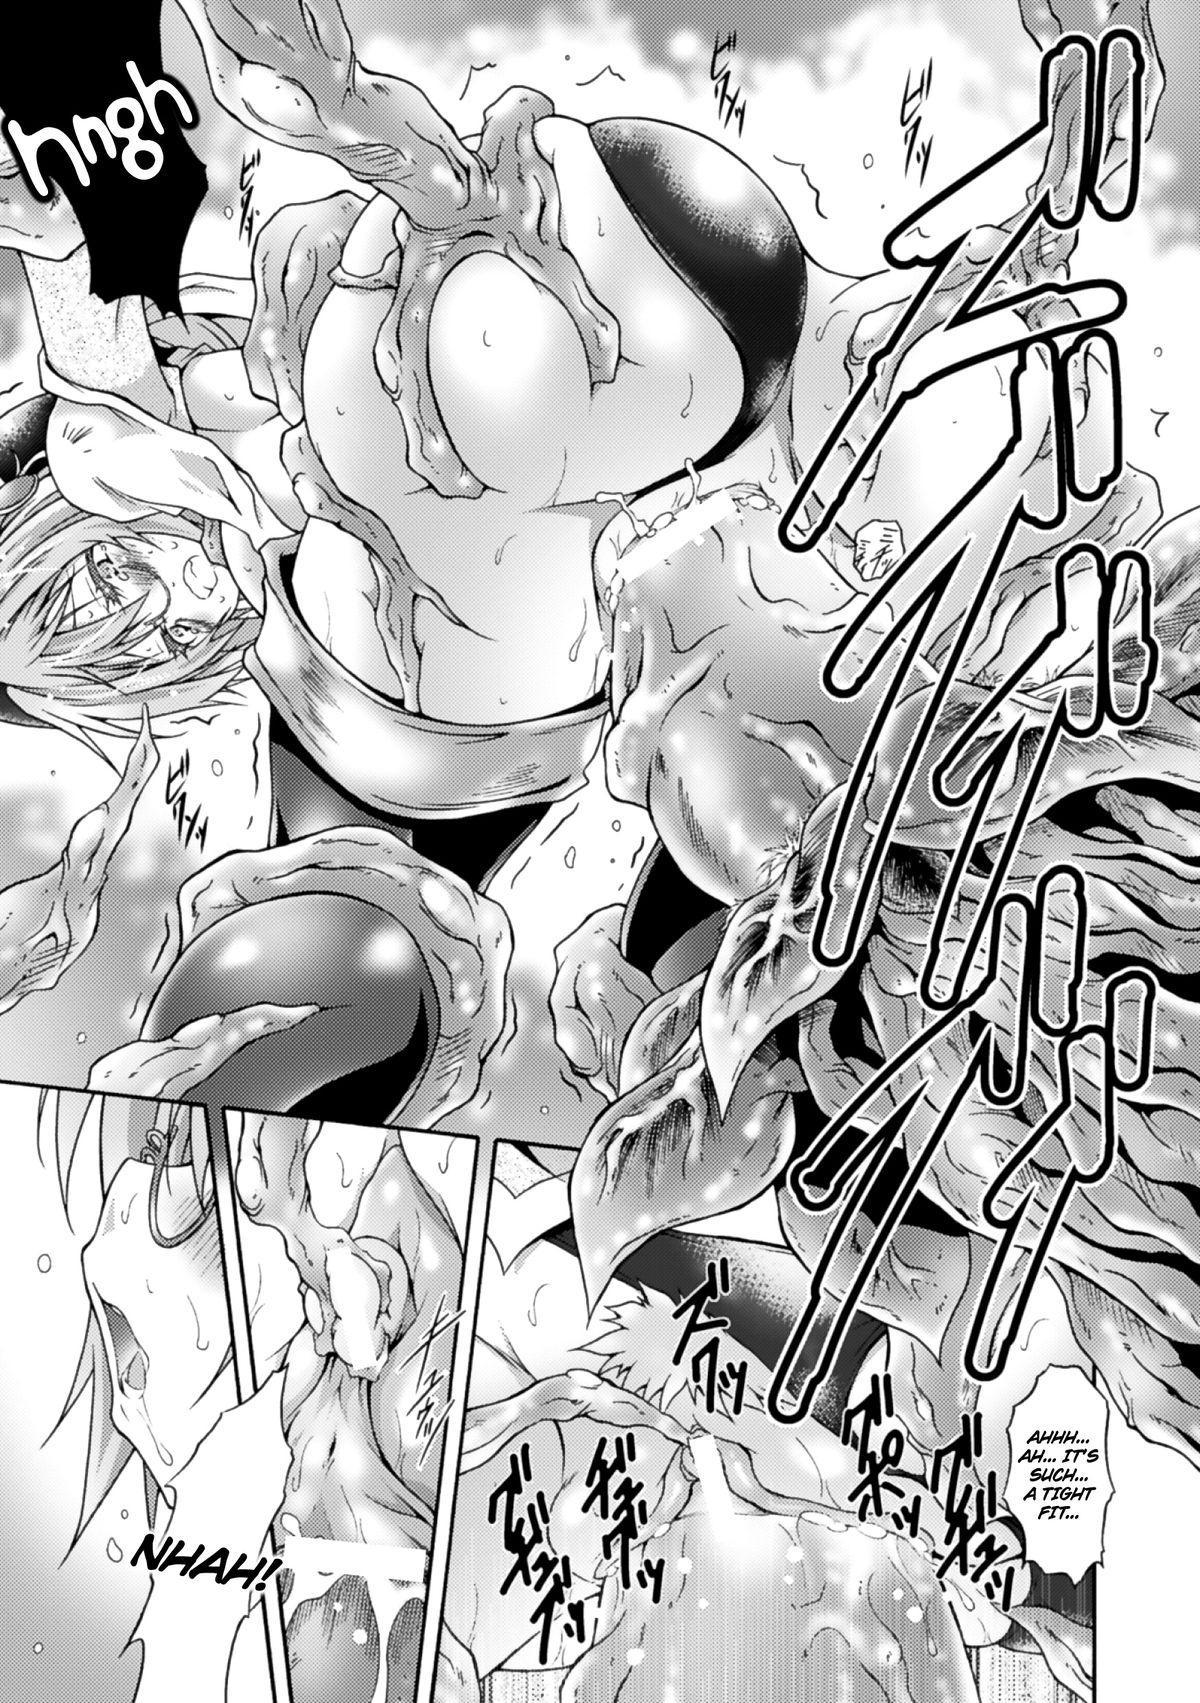 2D Comic Magazine Shokubutsukan de Monzetsu Acme Saki! Vol. 2 38